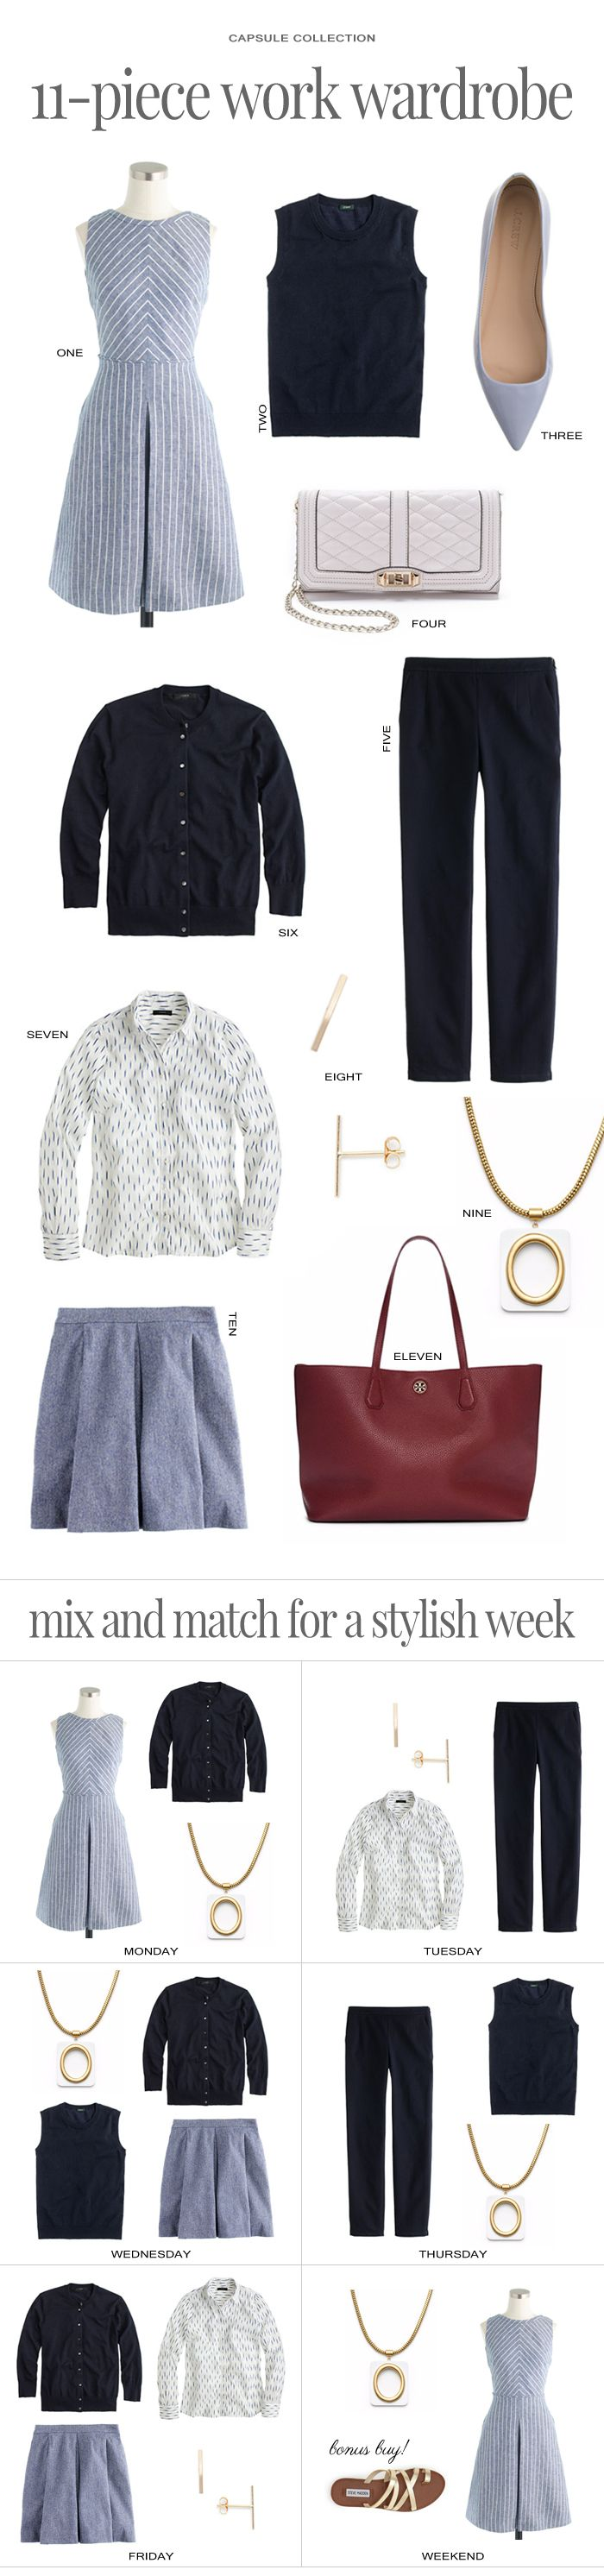 best 25 capsule wardrobe work ideas on pinterest work wardrobe